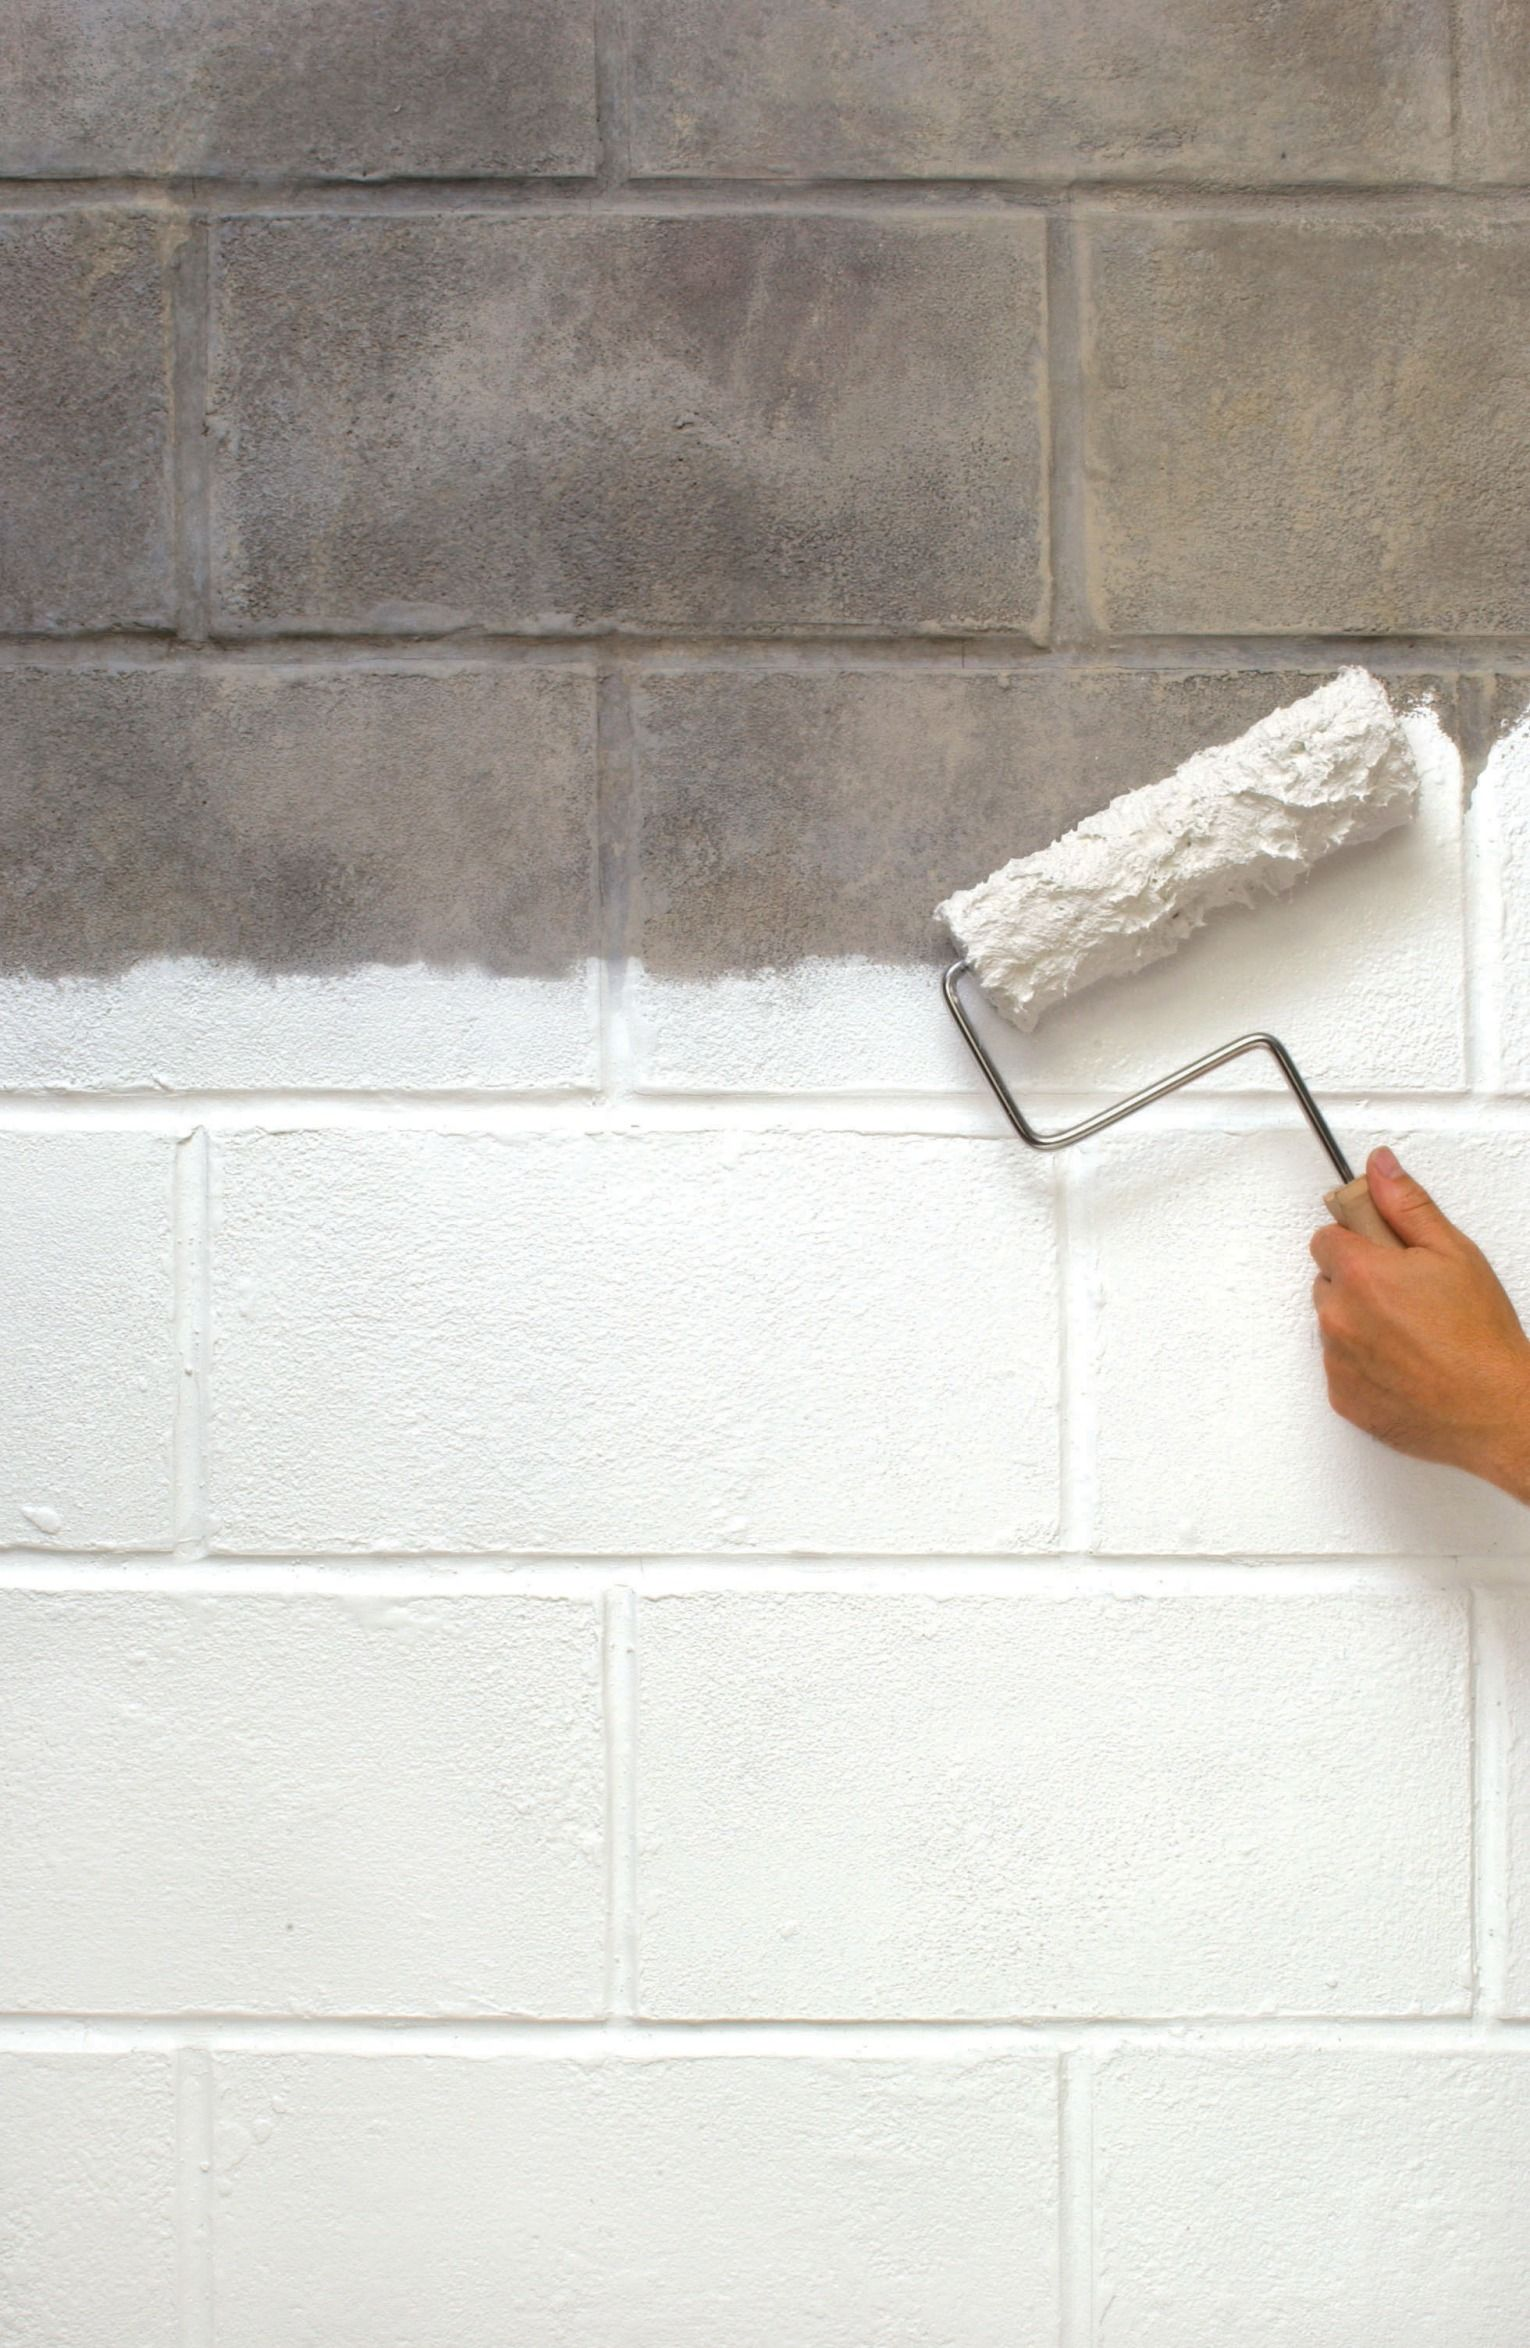 Help Your Home Stay Dry Zinsser 174 Watertite 174 Mold Amp Mildew